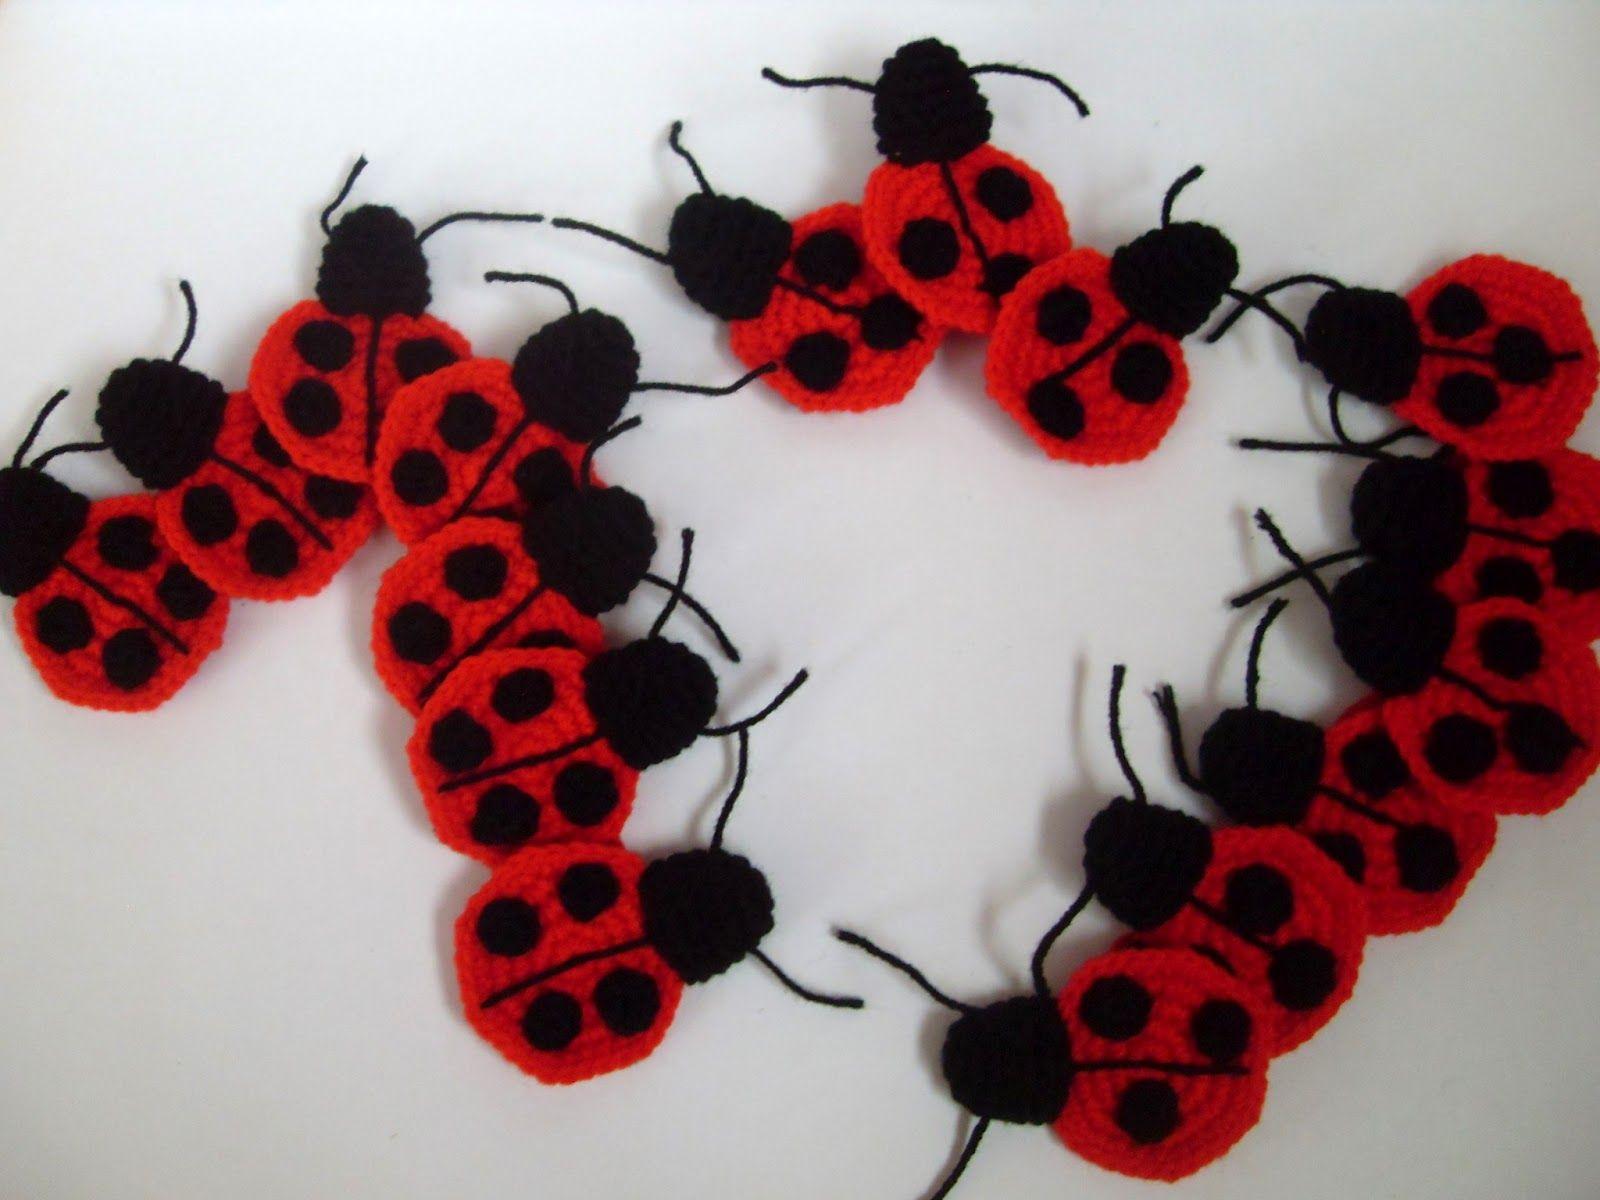 Free crohet applique patterns crochetfun free pattern free crochet pattern for ladybug appliqu bankloansurffo Choice Image